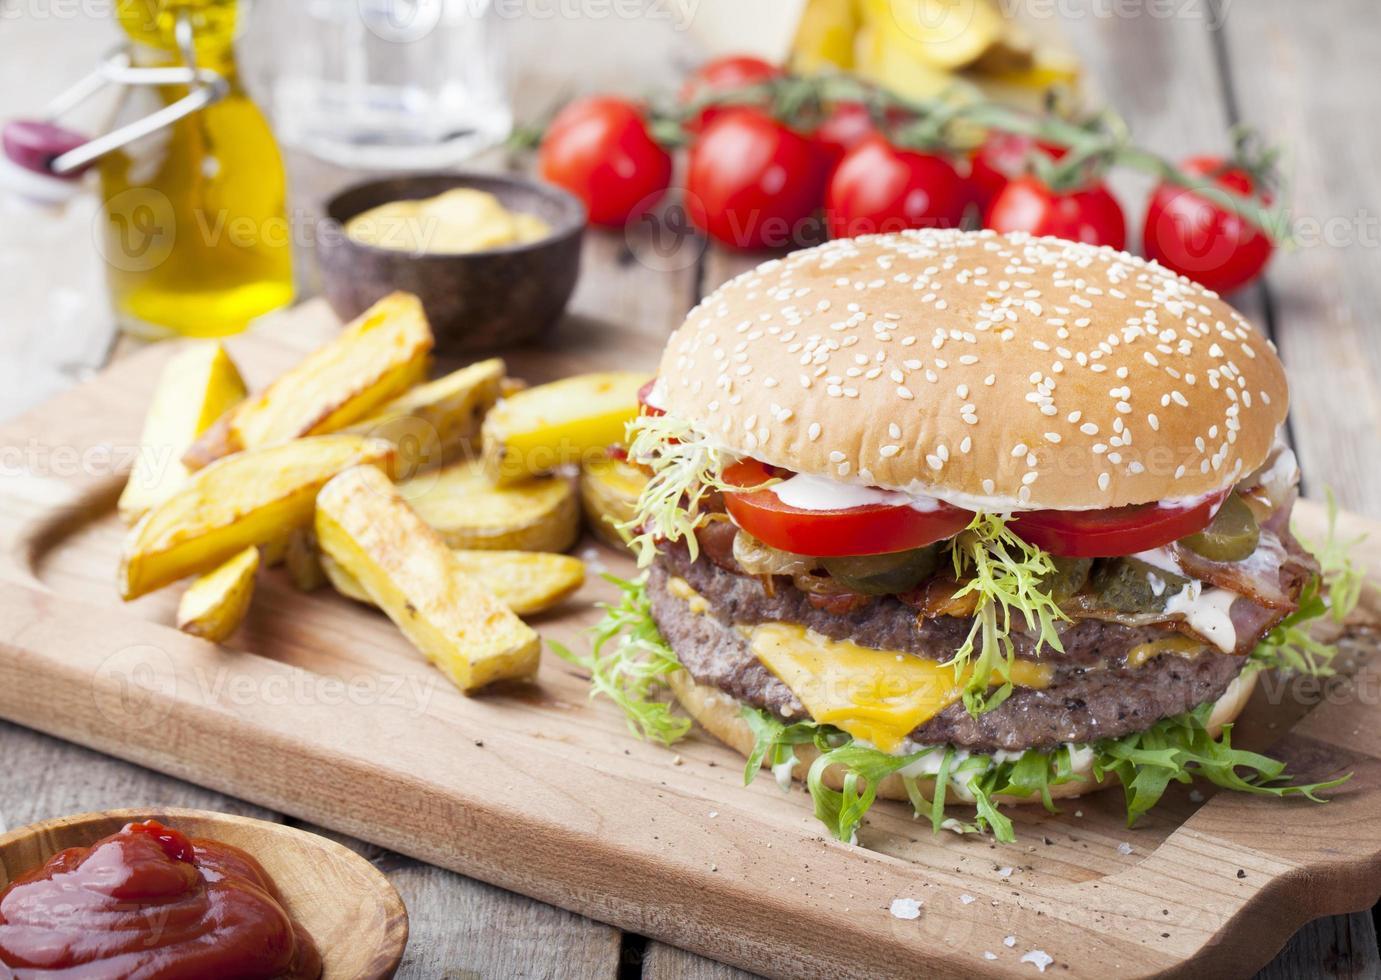 hambúrguer, hambúrguer com batatas fritas, ketchup, mostarda e legumes frescos foto